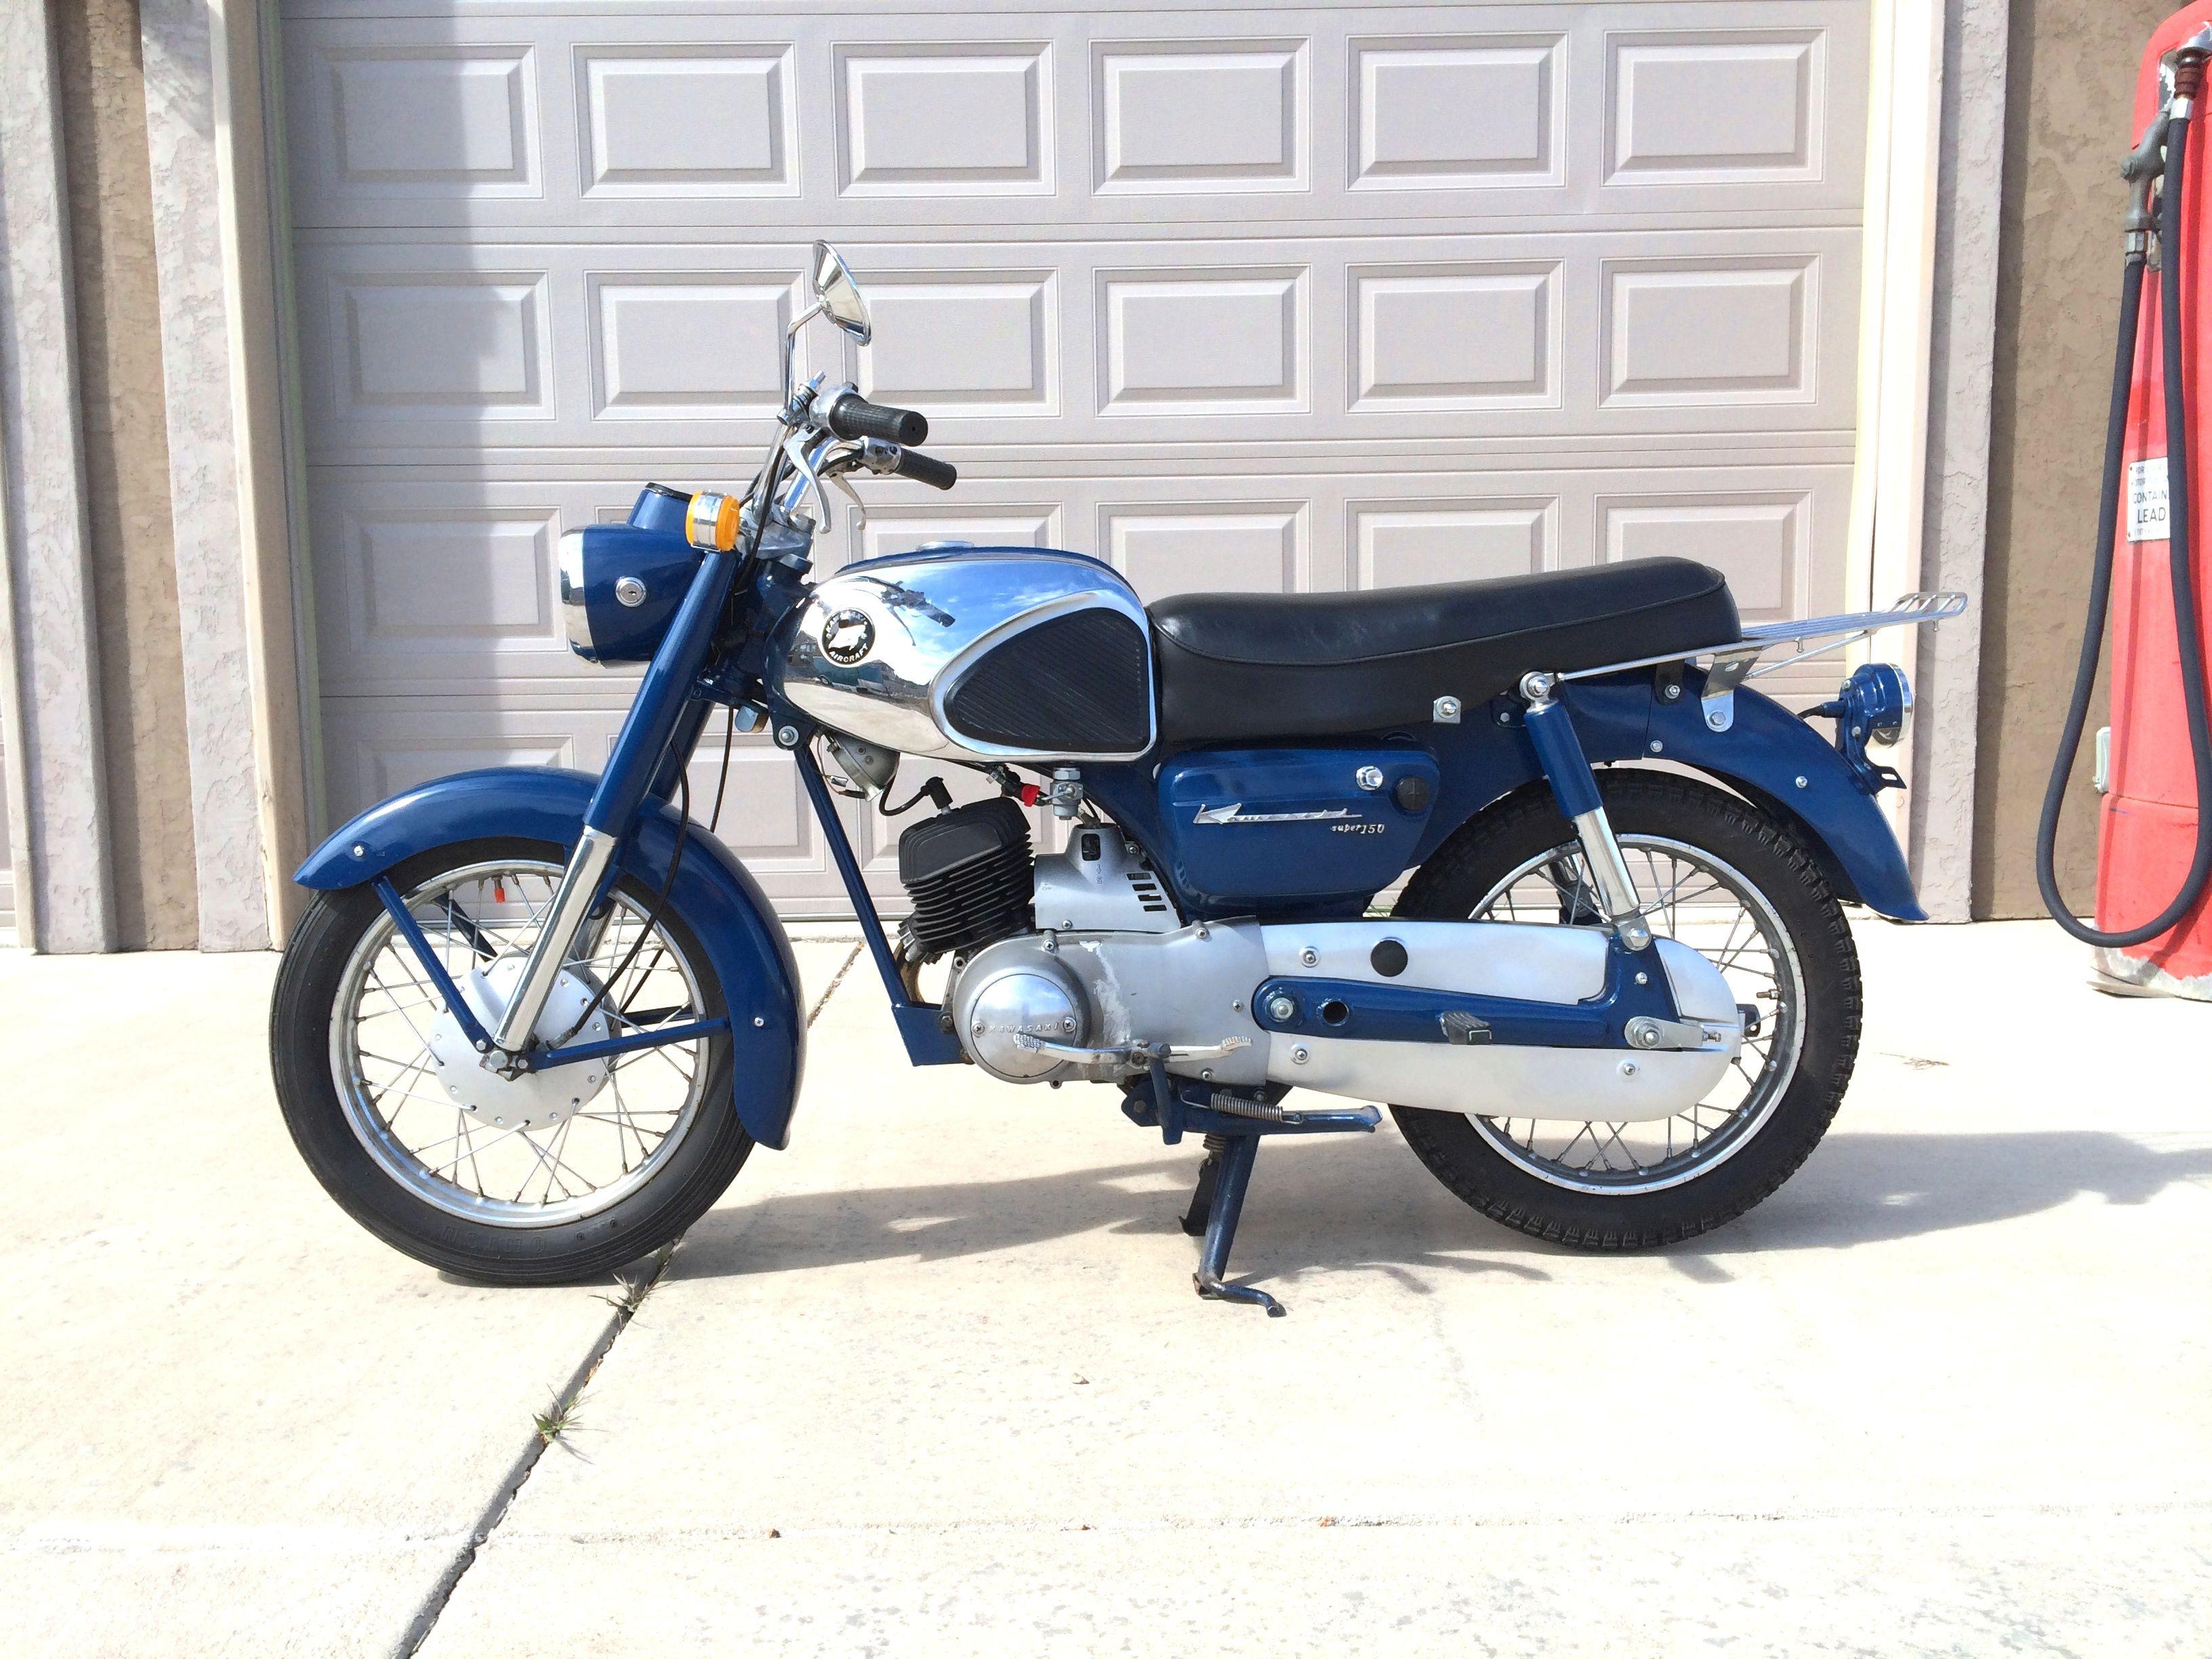 1965 Kawasaki B8s Super 150 150cc Single Cyl W 4spd Rotary Shift Motorcycle Honda Shadow Wiring Diagram Transmission